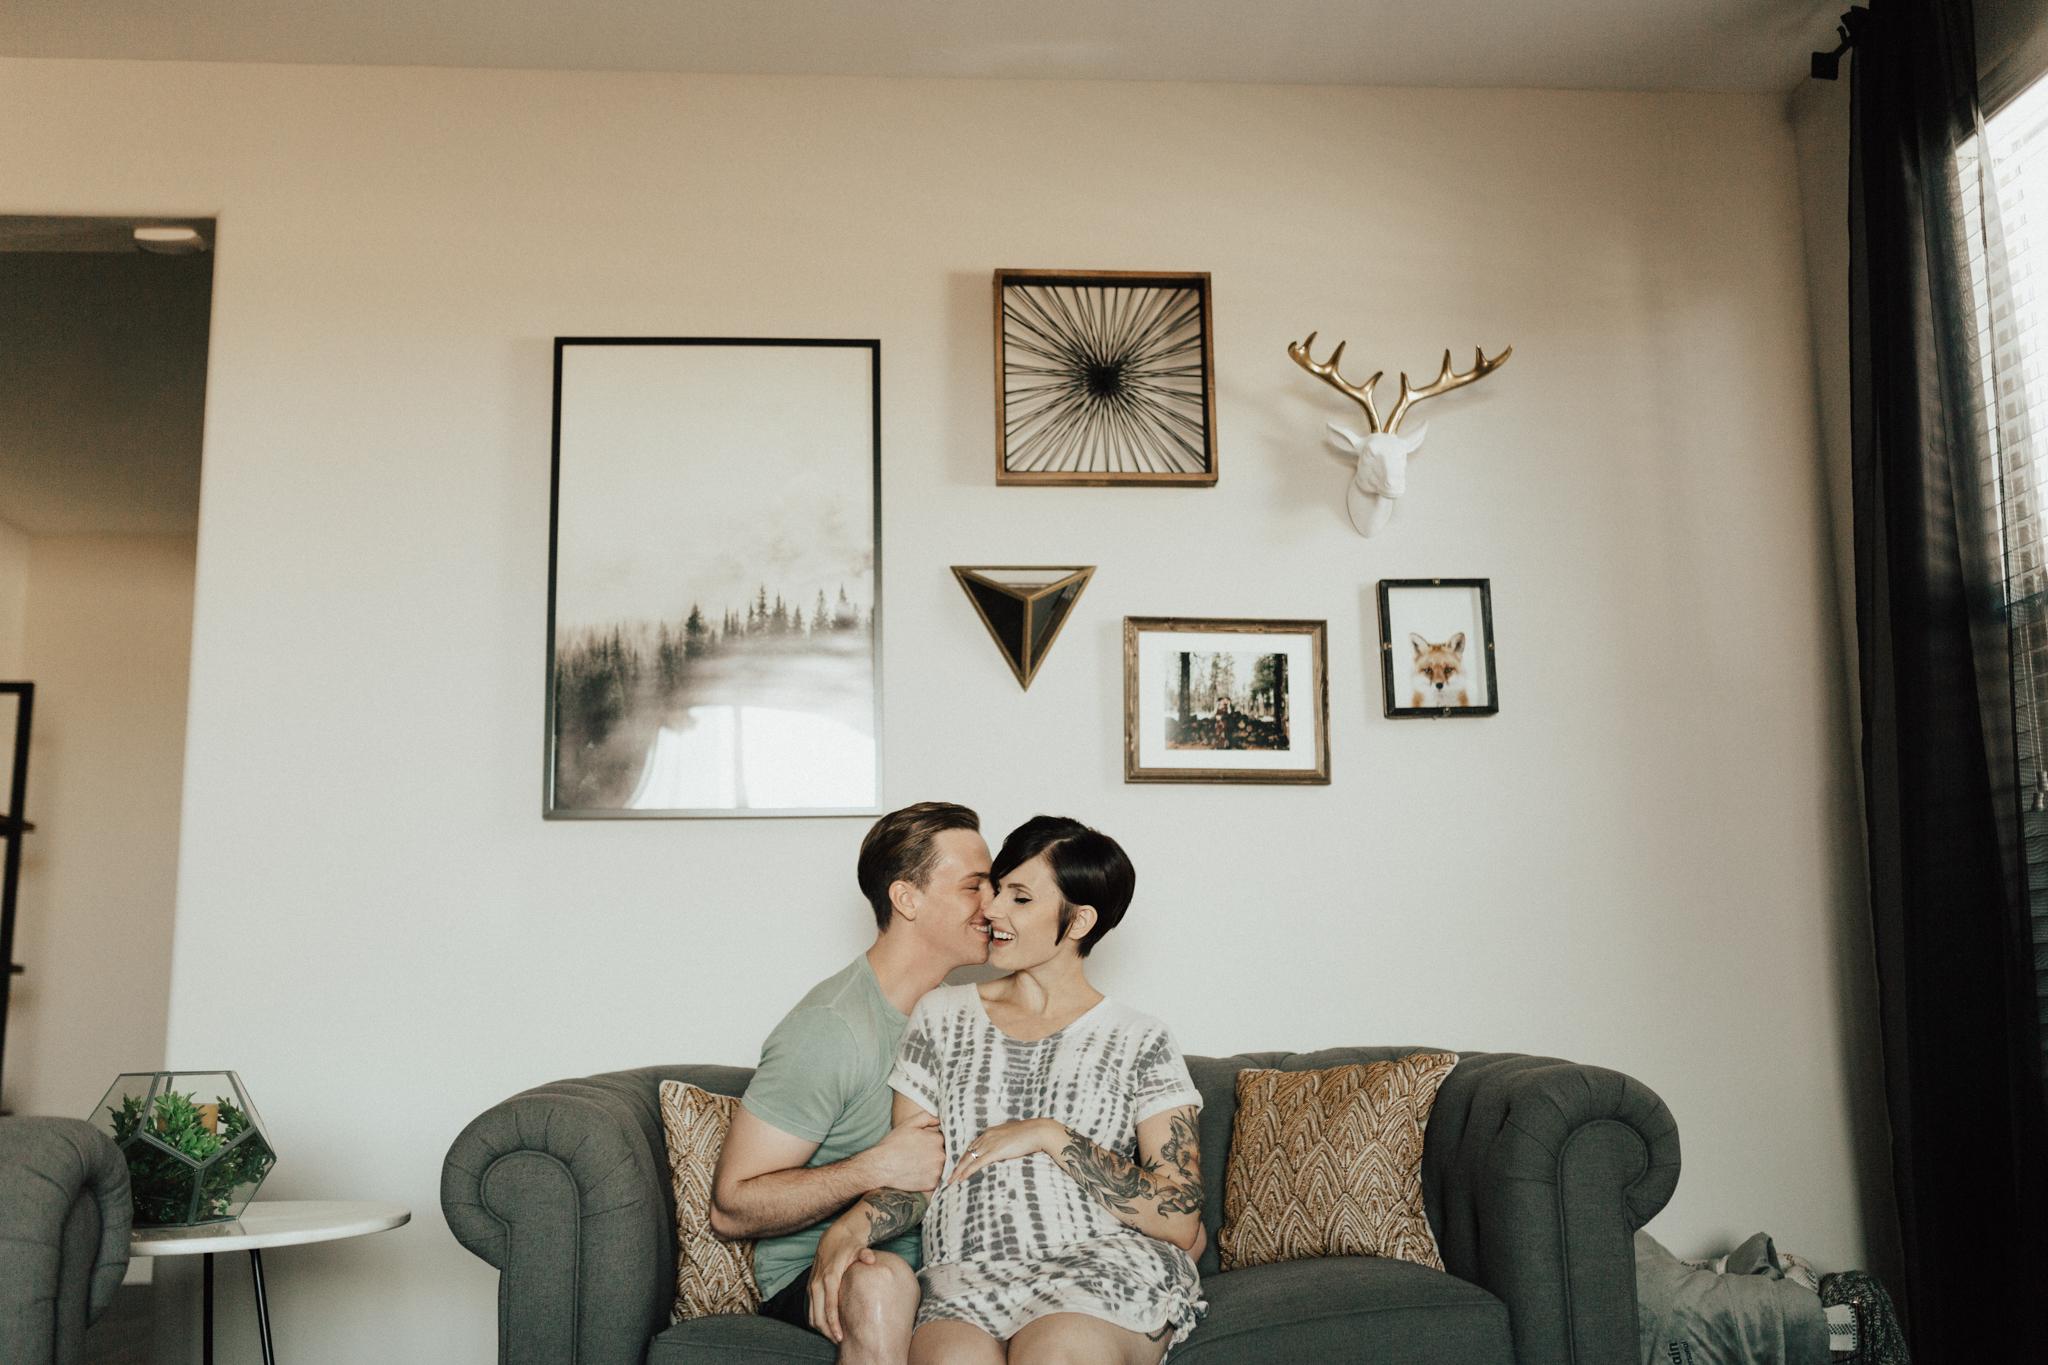 Arizona-Intimate-In-Home-Session-Maternity (4).jpg